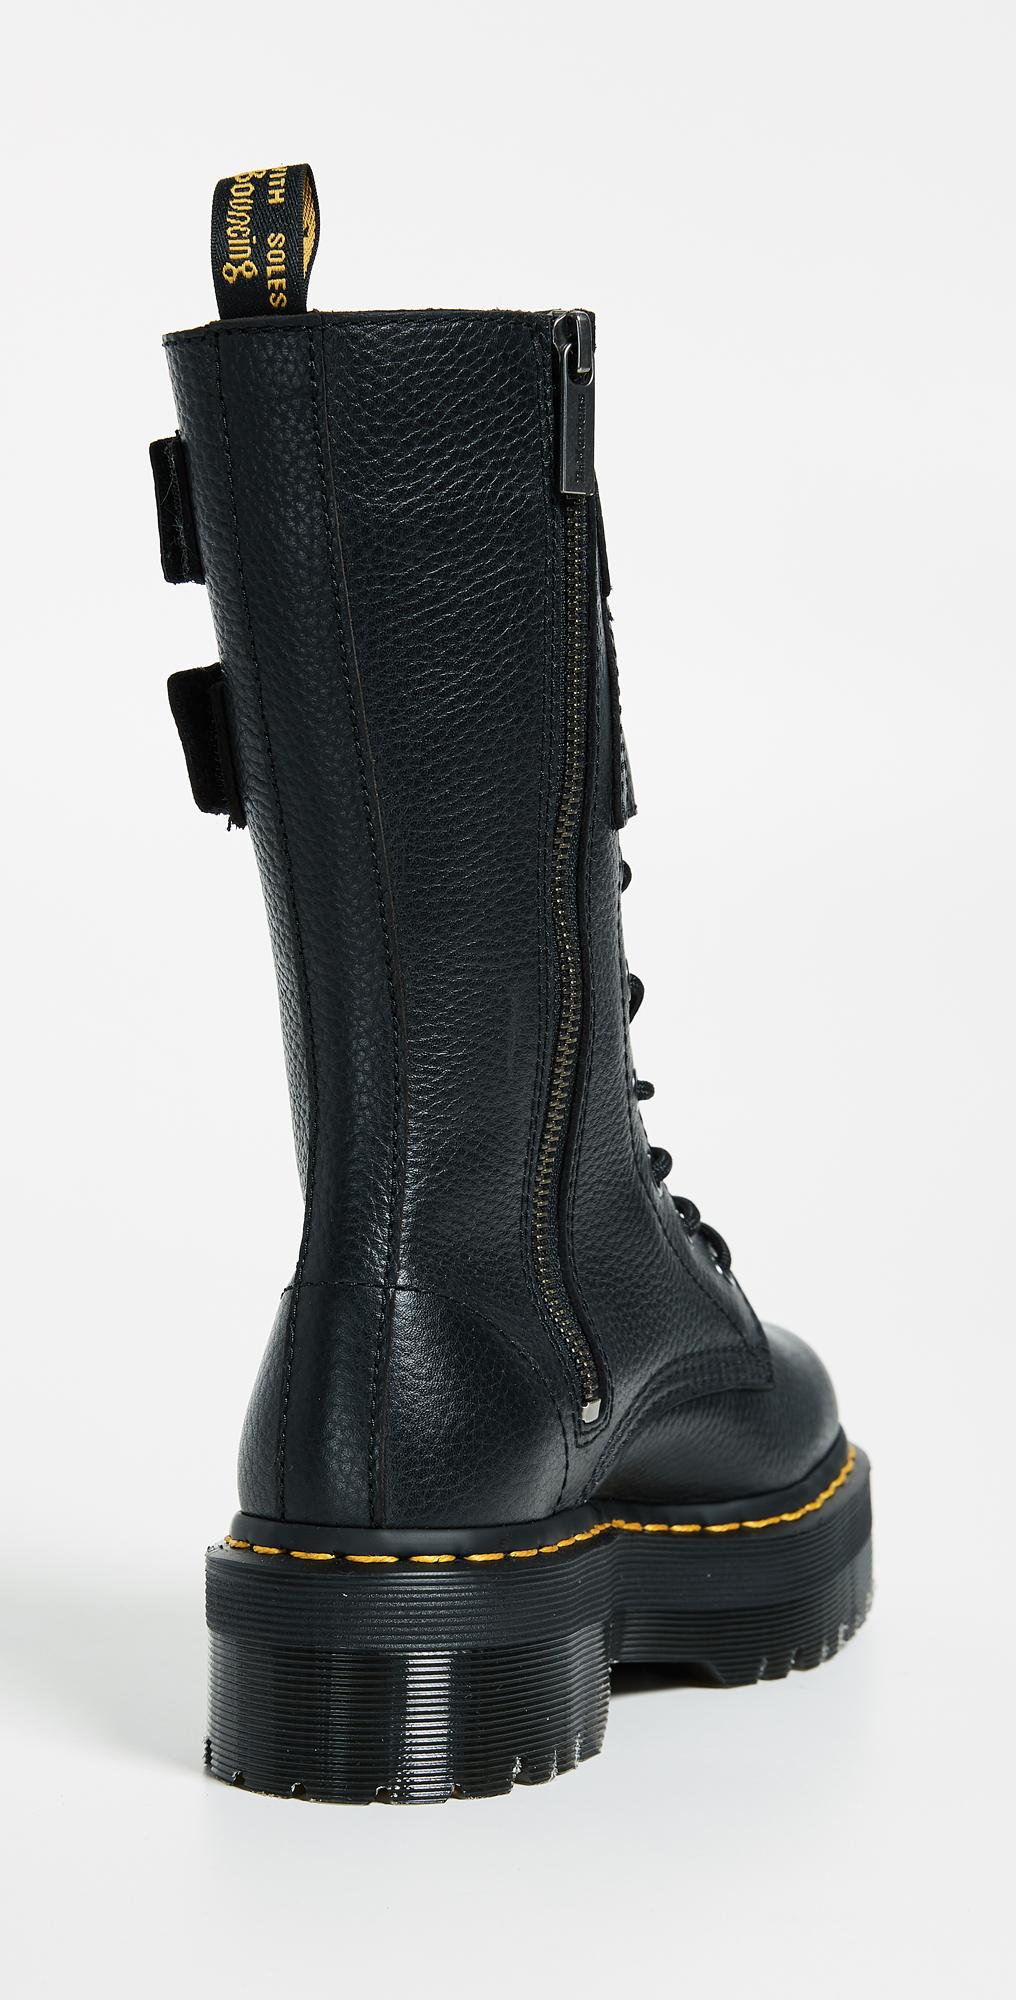 jagger boots dr martens